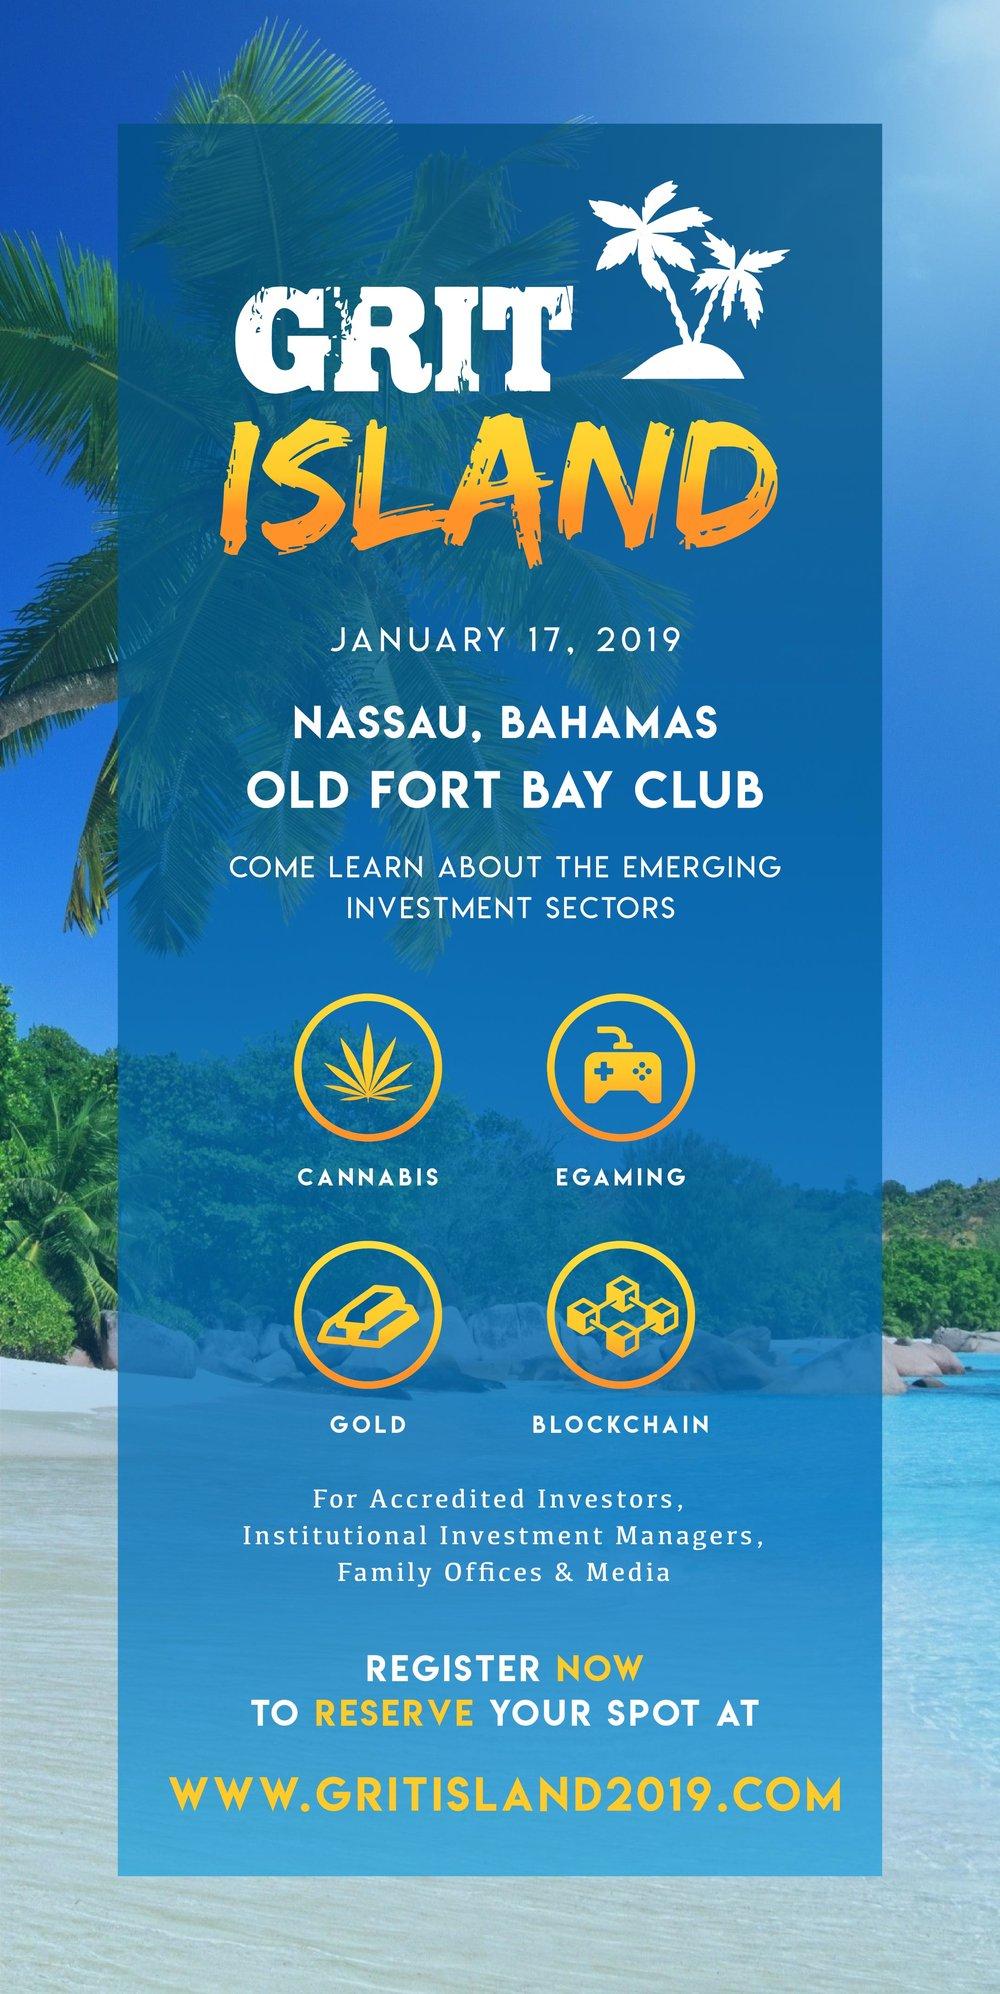 Grit_Island_Invite-01.jpg